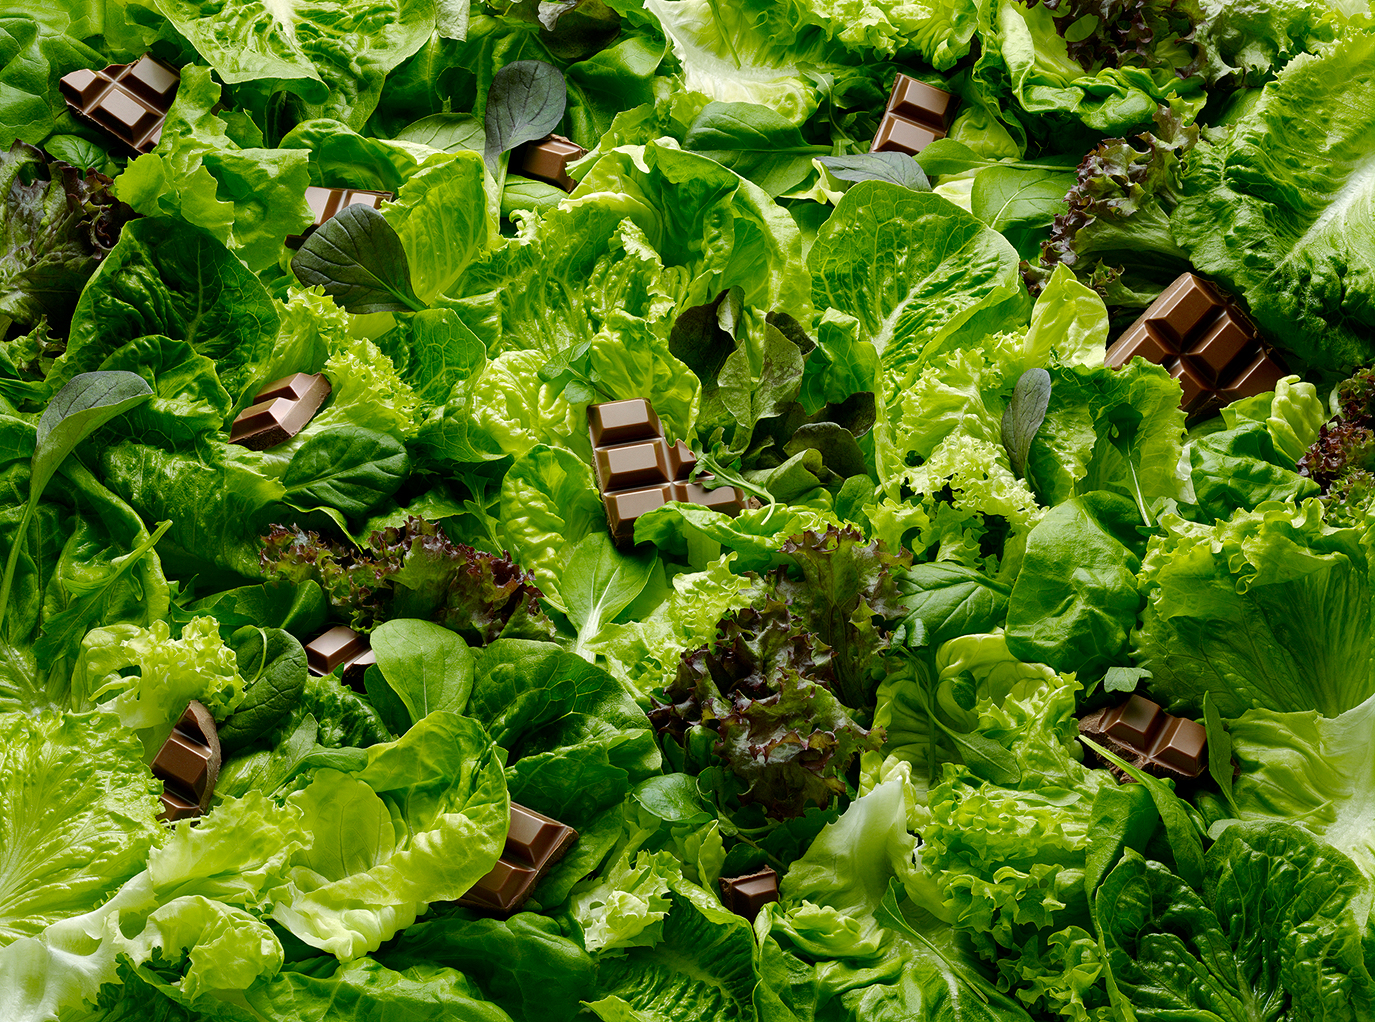 saladpitch-domlee.jpg